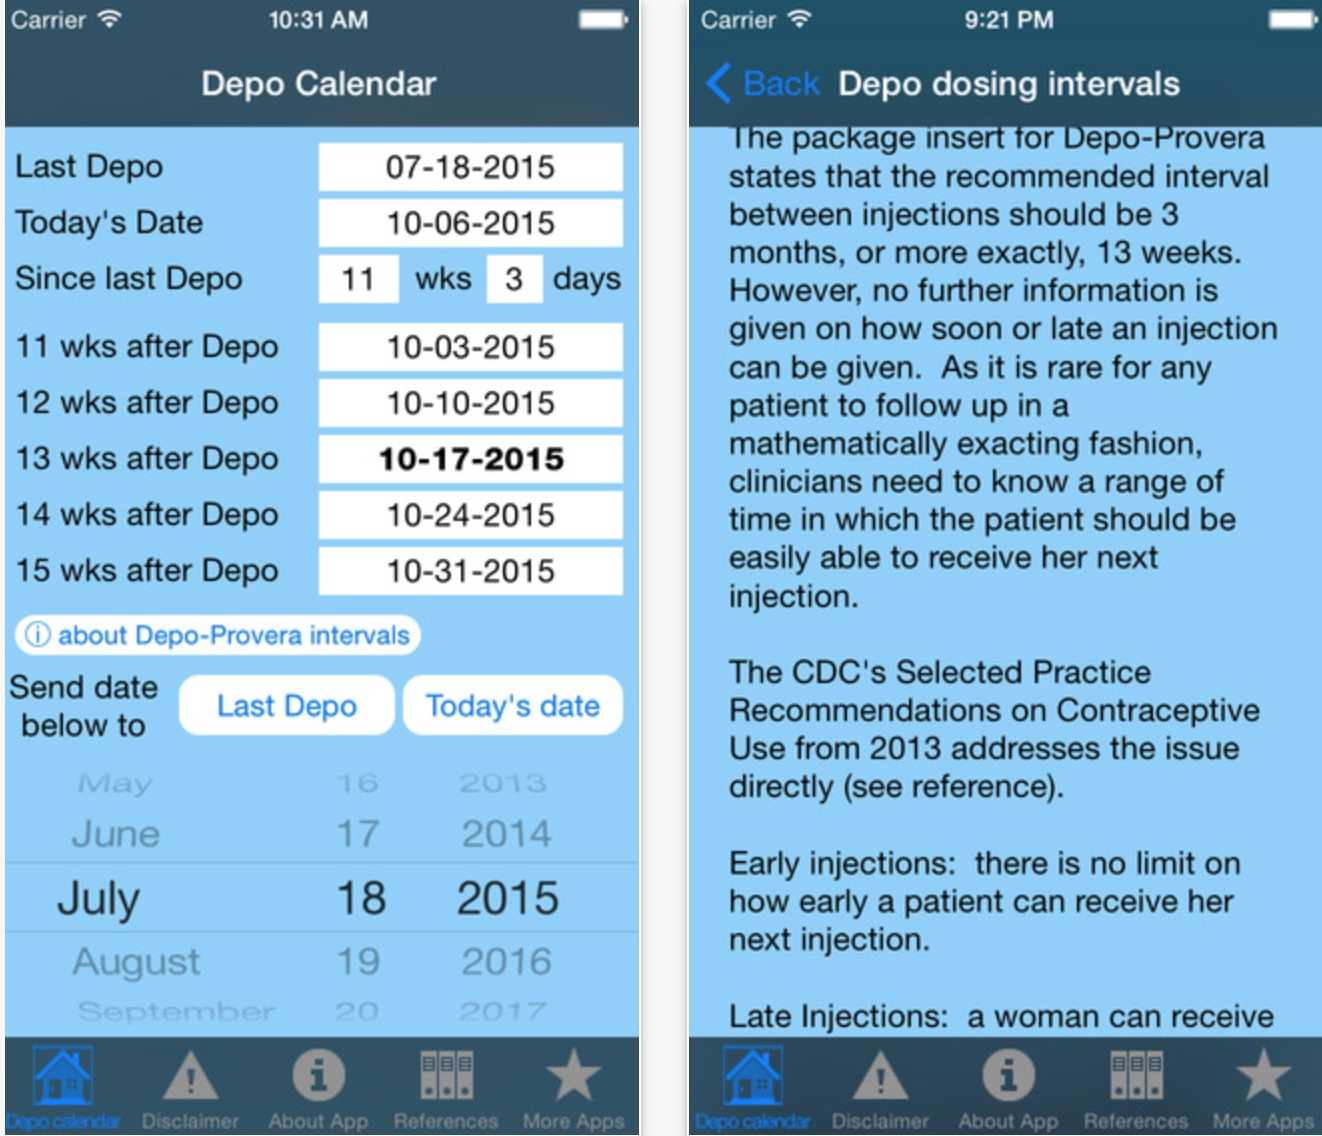 Depo Calendar App Could Significantly Improve Contraception  Depo Provera Calender